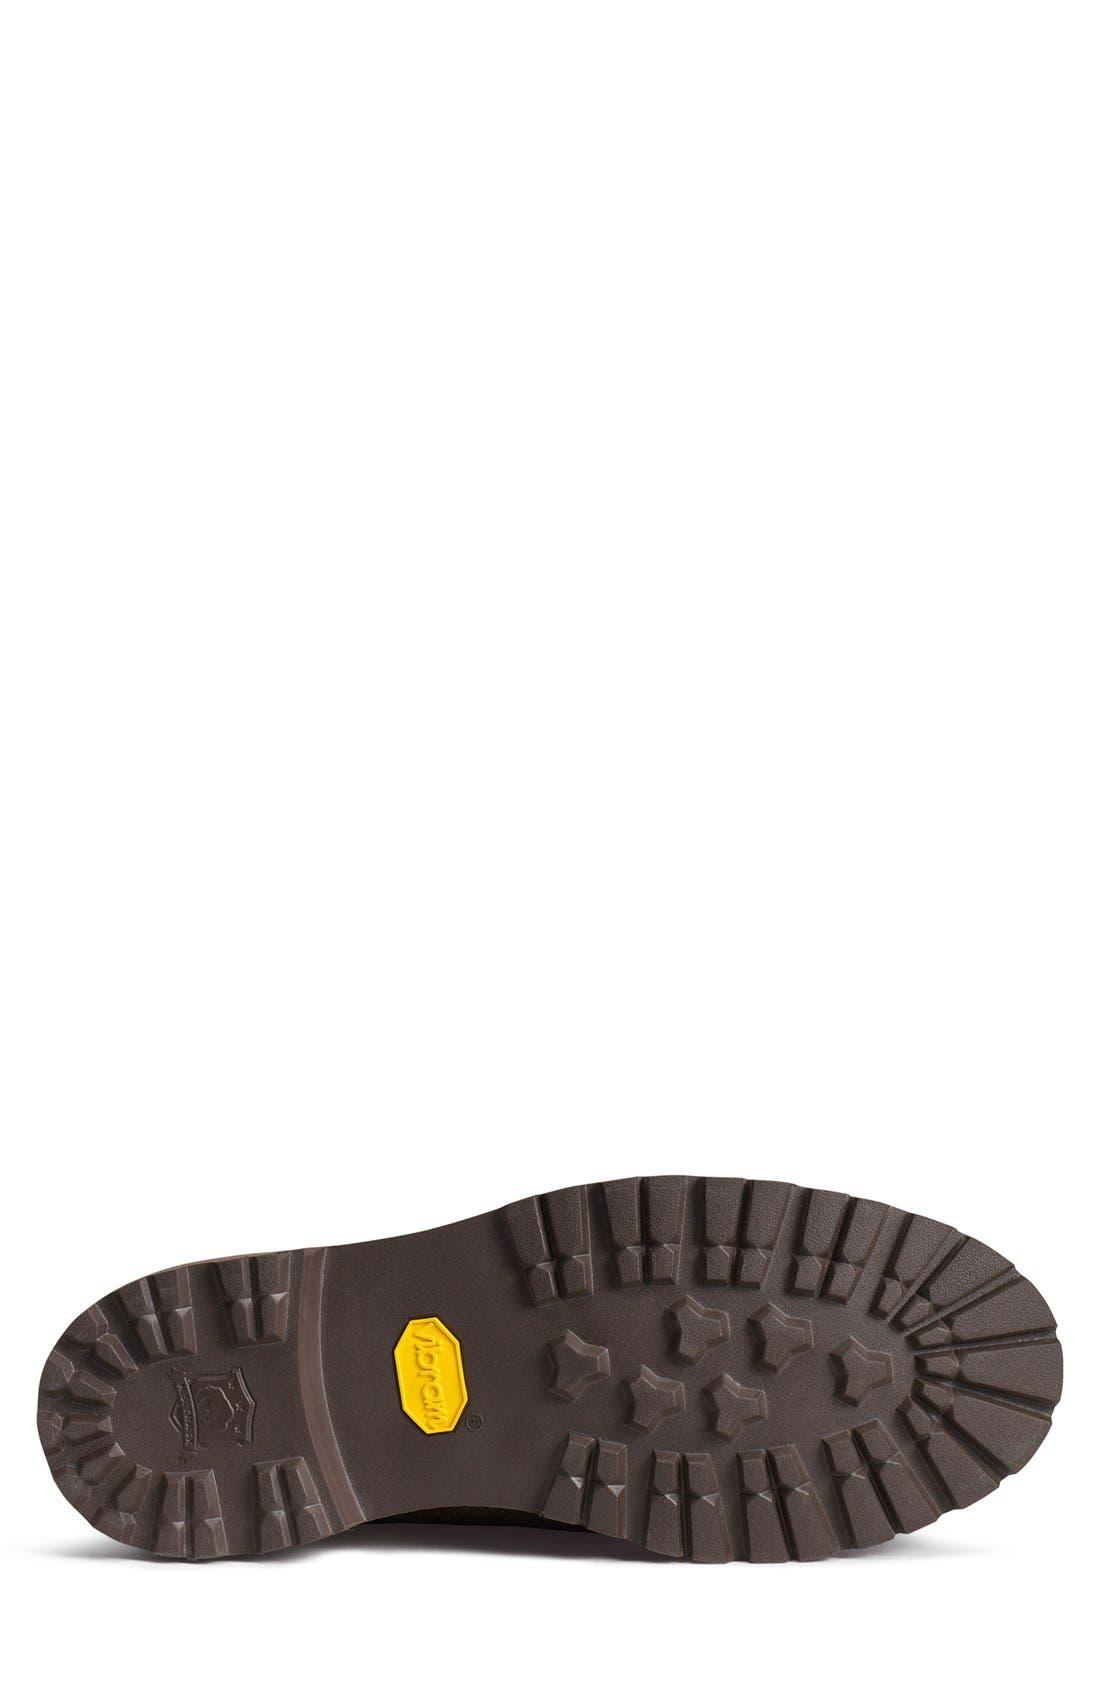 'Gulch II' Chukka Boot,                             Alternate thumbnail 4, color,                             024